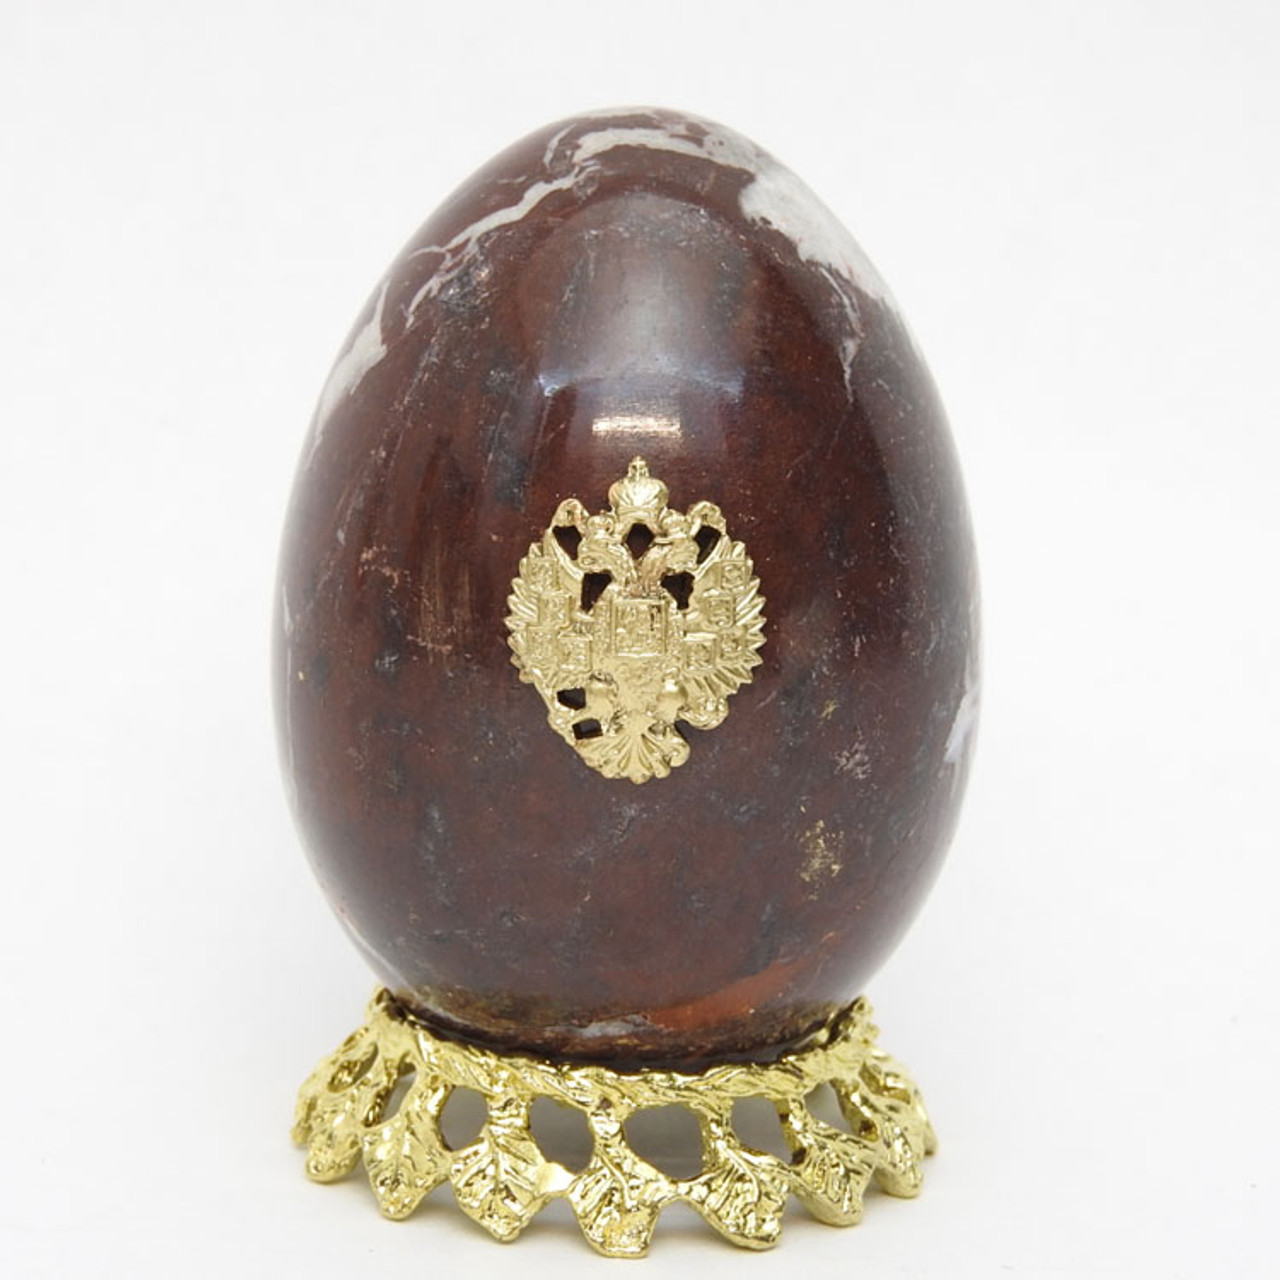 Marble Imperial Russian Eagle Egg Mahogany 2